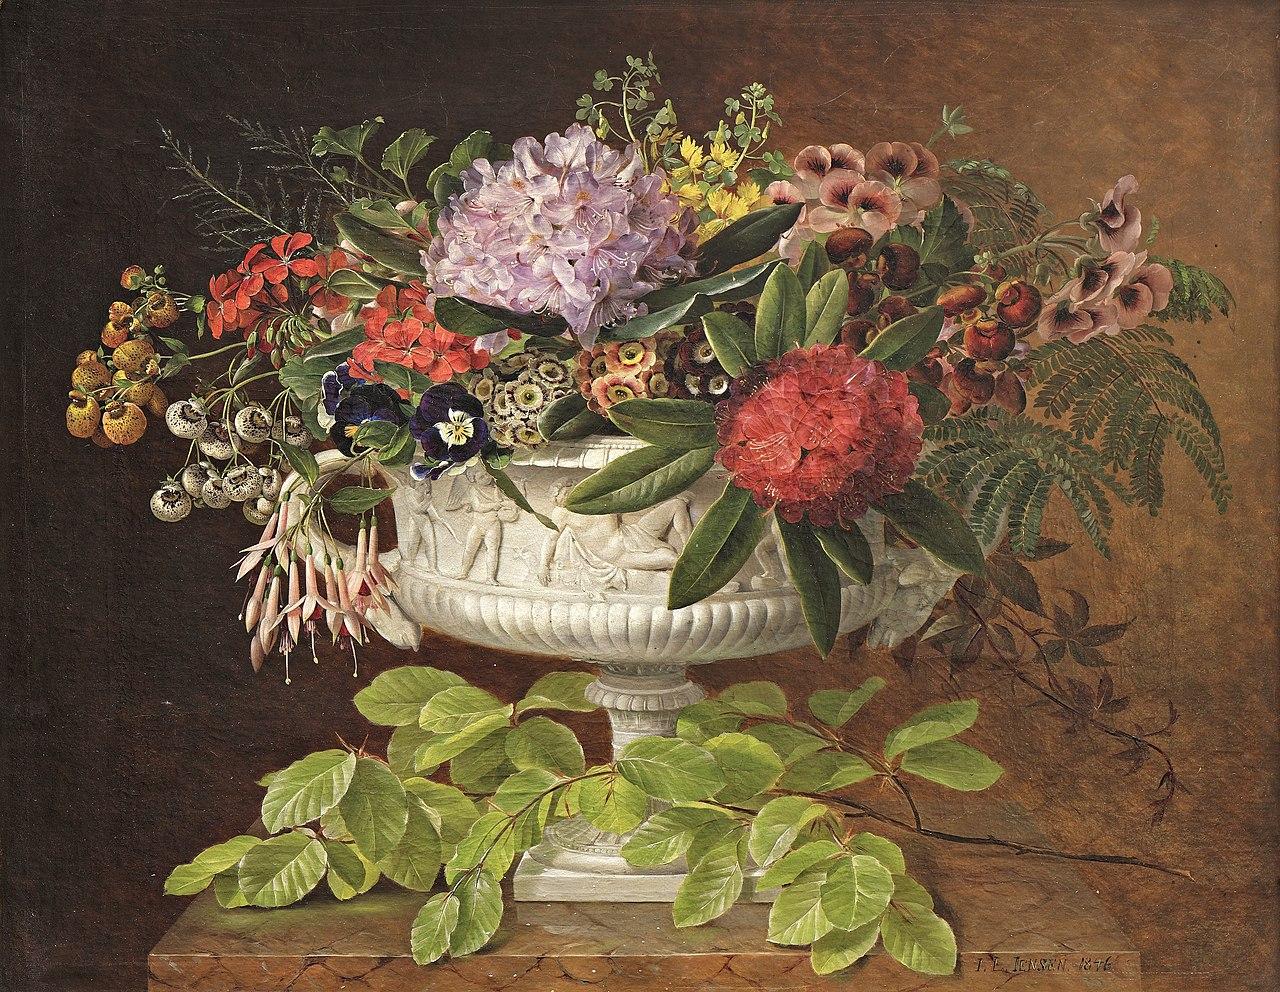 J.L. Jensen, Blomster i en opsats på marmorkarm med bøgegren, 1846, 0224NMK, Nivaagaards Malerisamling.jpg